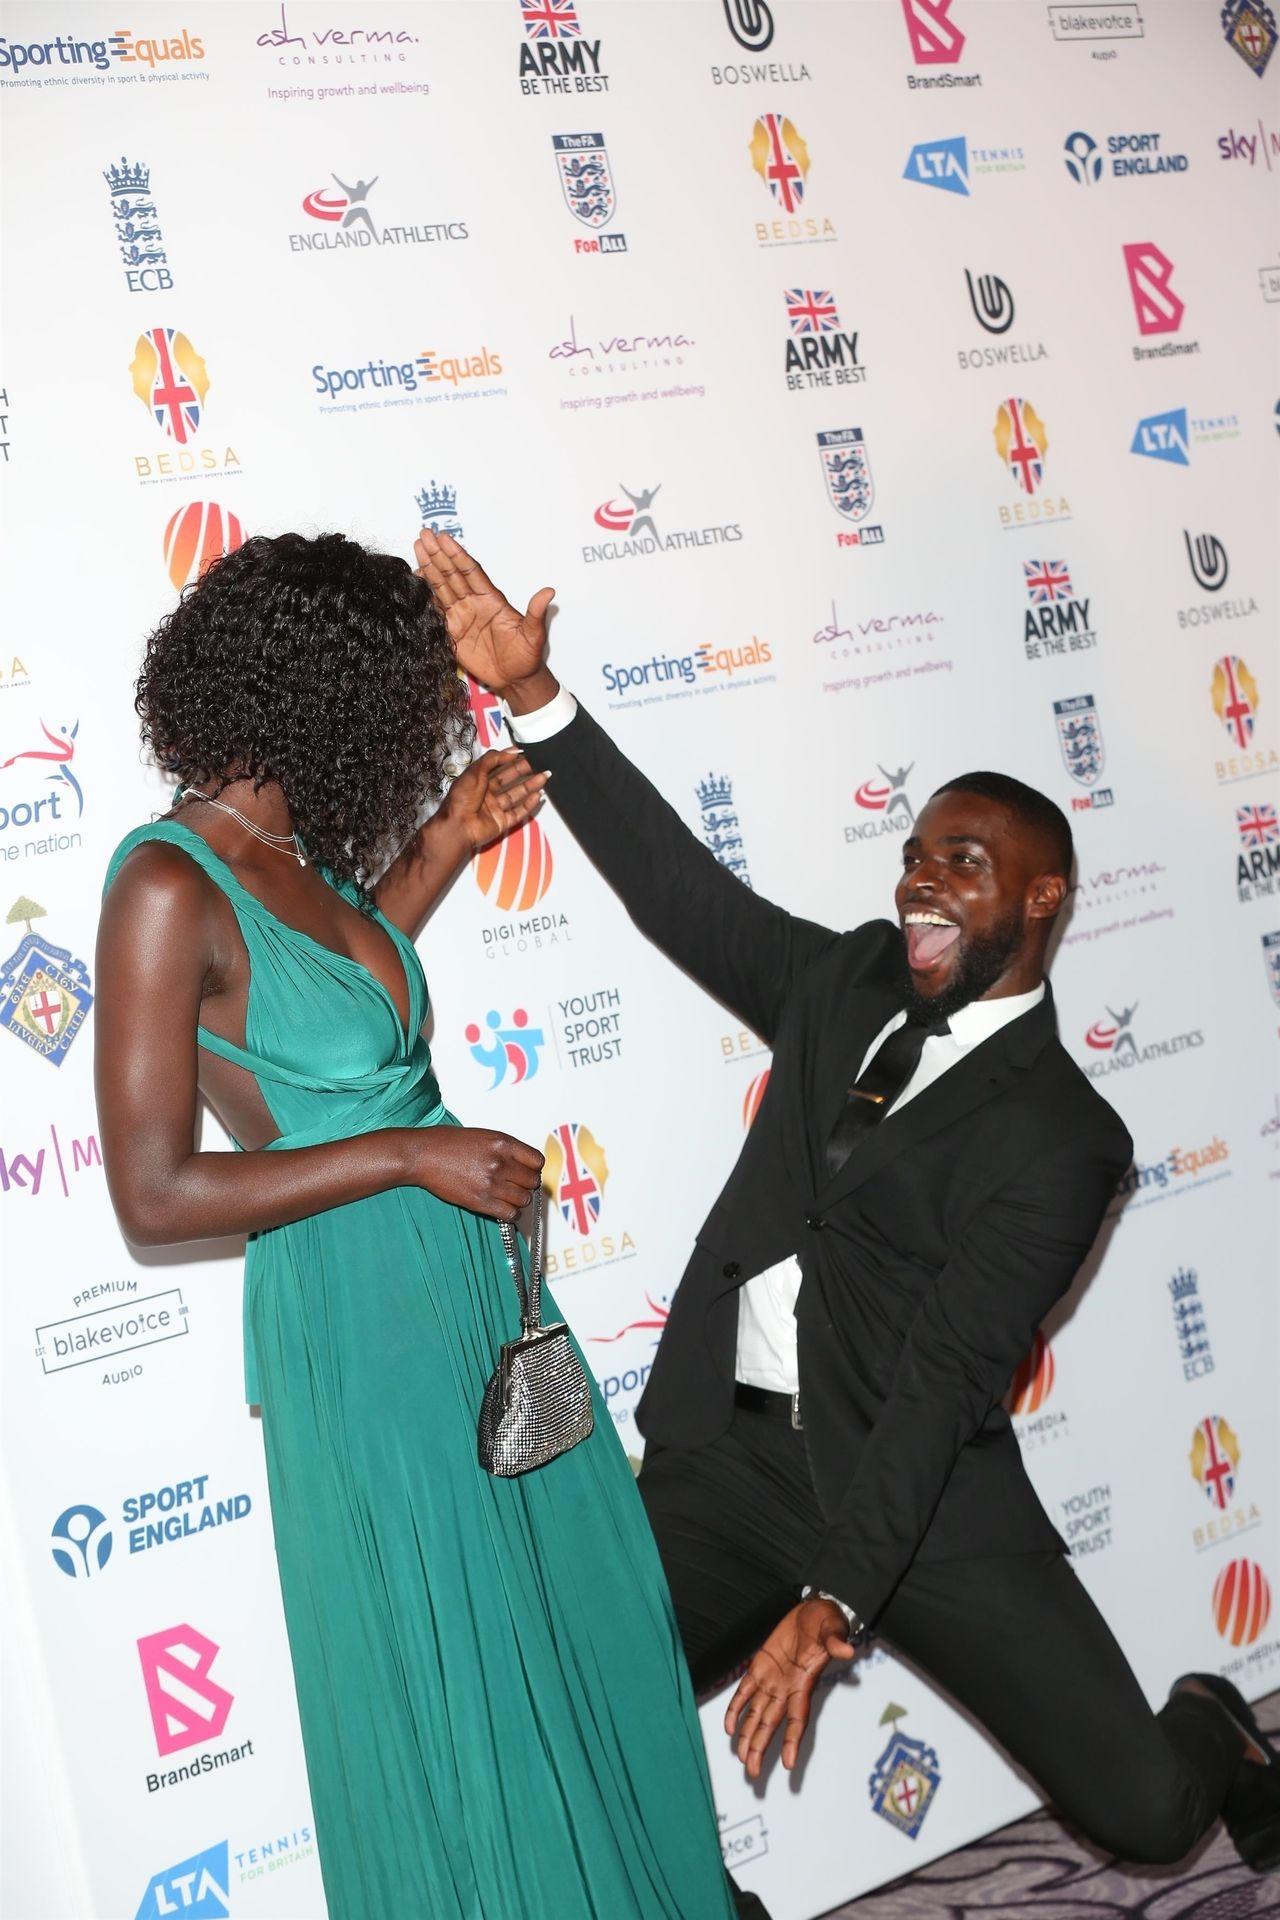 Mike Boateng & Priscilla Anyabu Are Seen At British Ethnic Diversity Sports Awards 0033